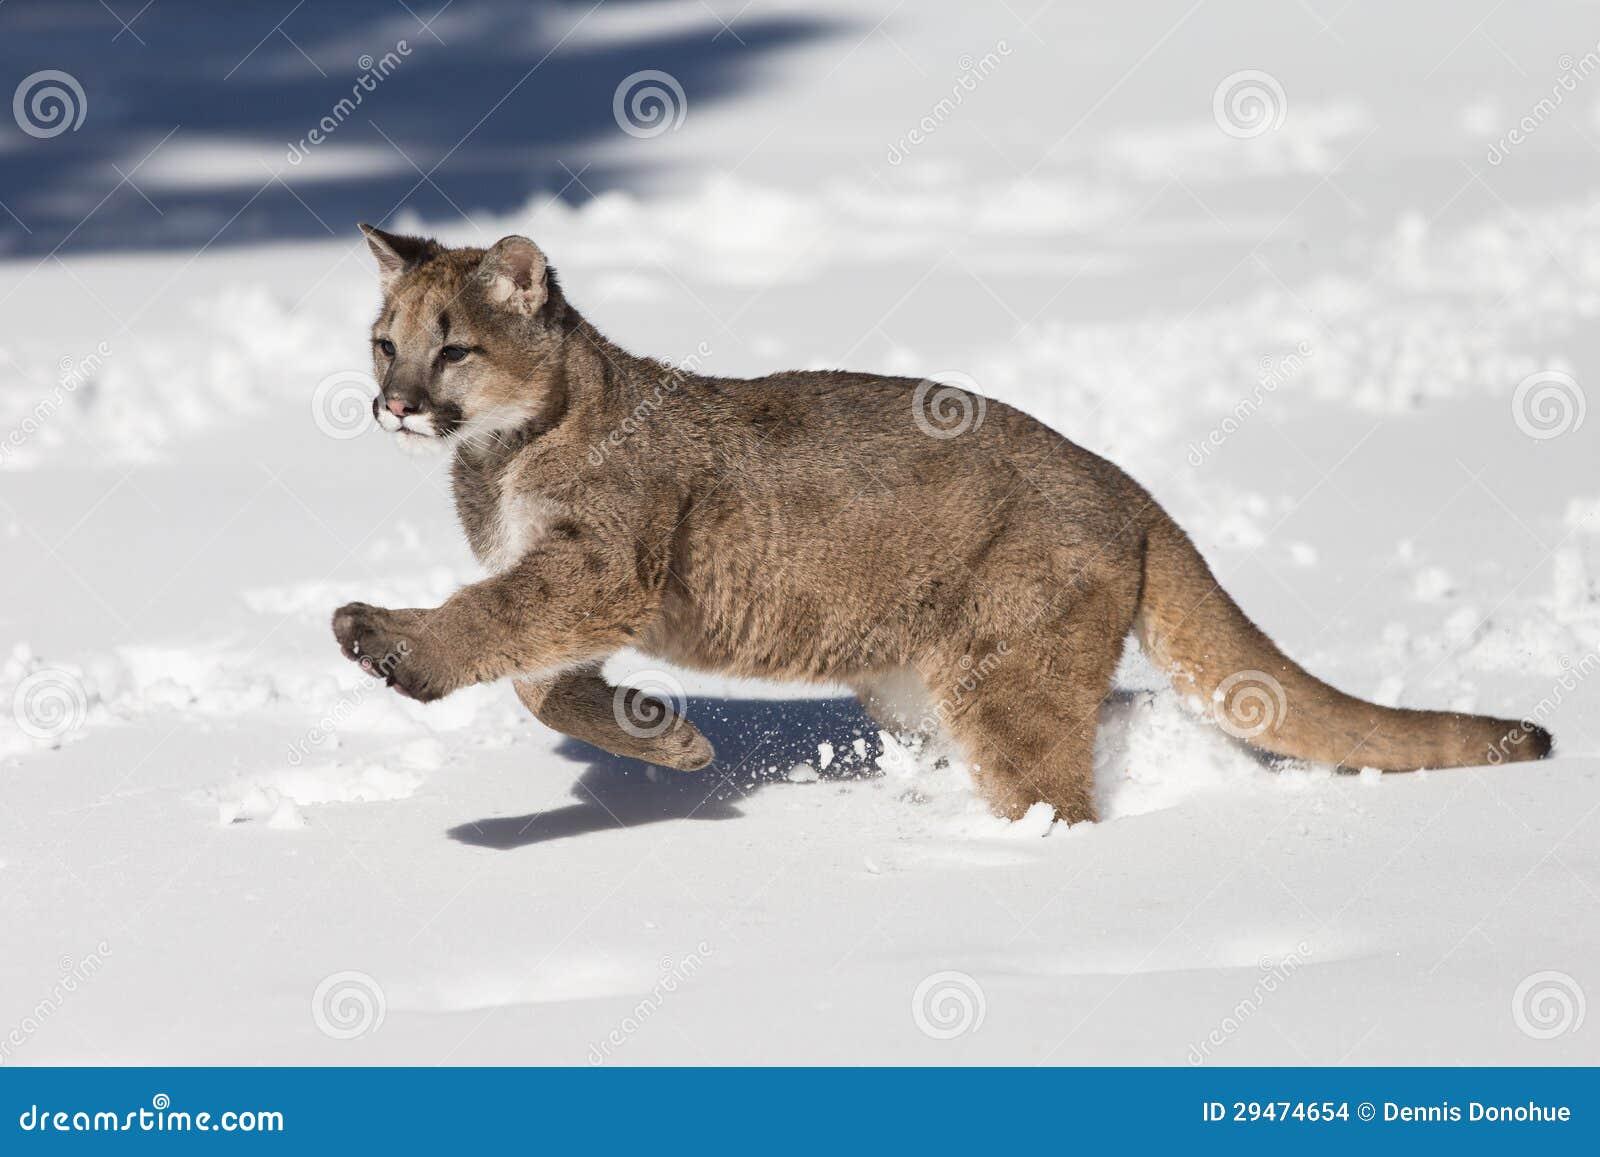 7255d6800bb9 Mountain lion or Puma walking in sagebrush in rocky mountains